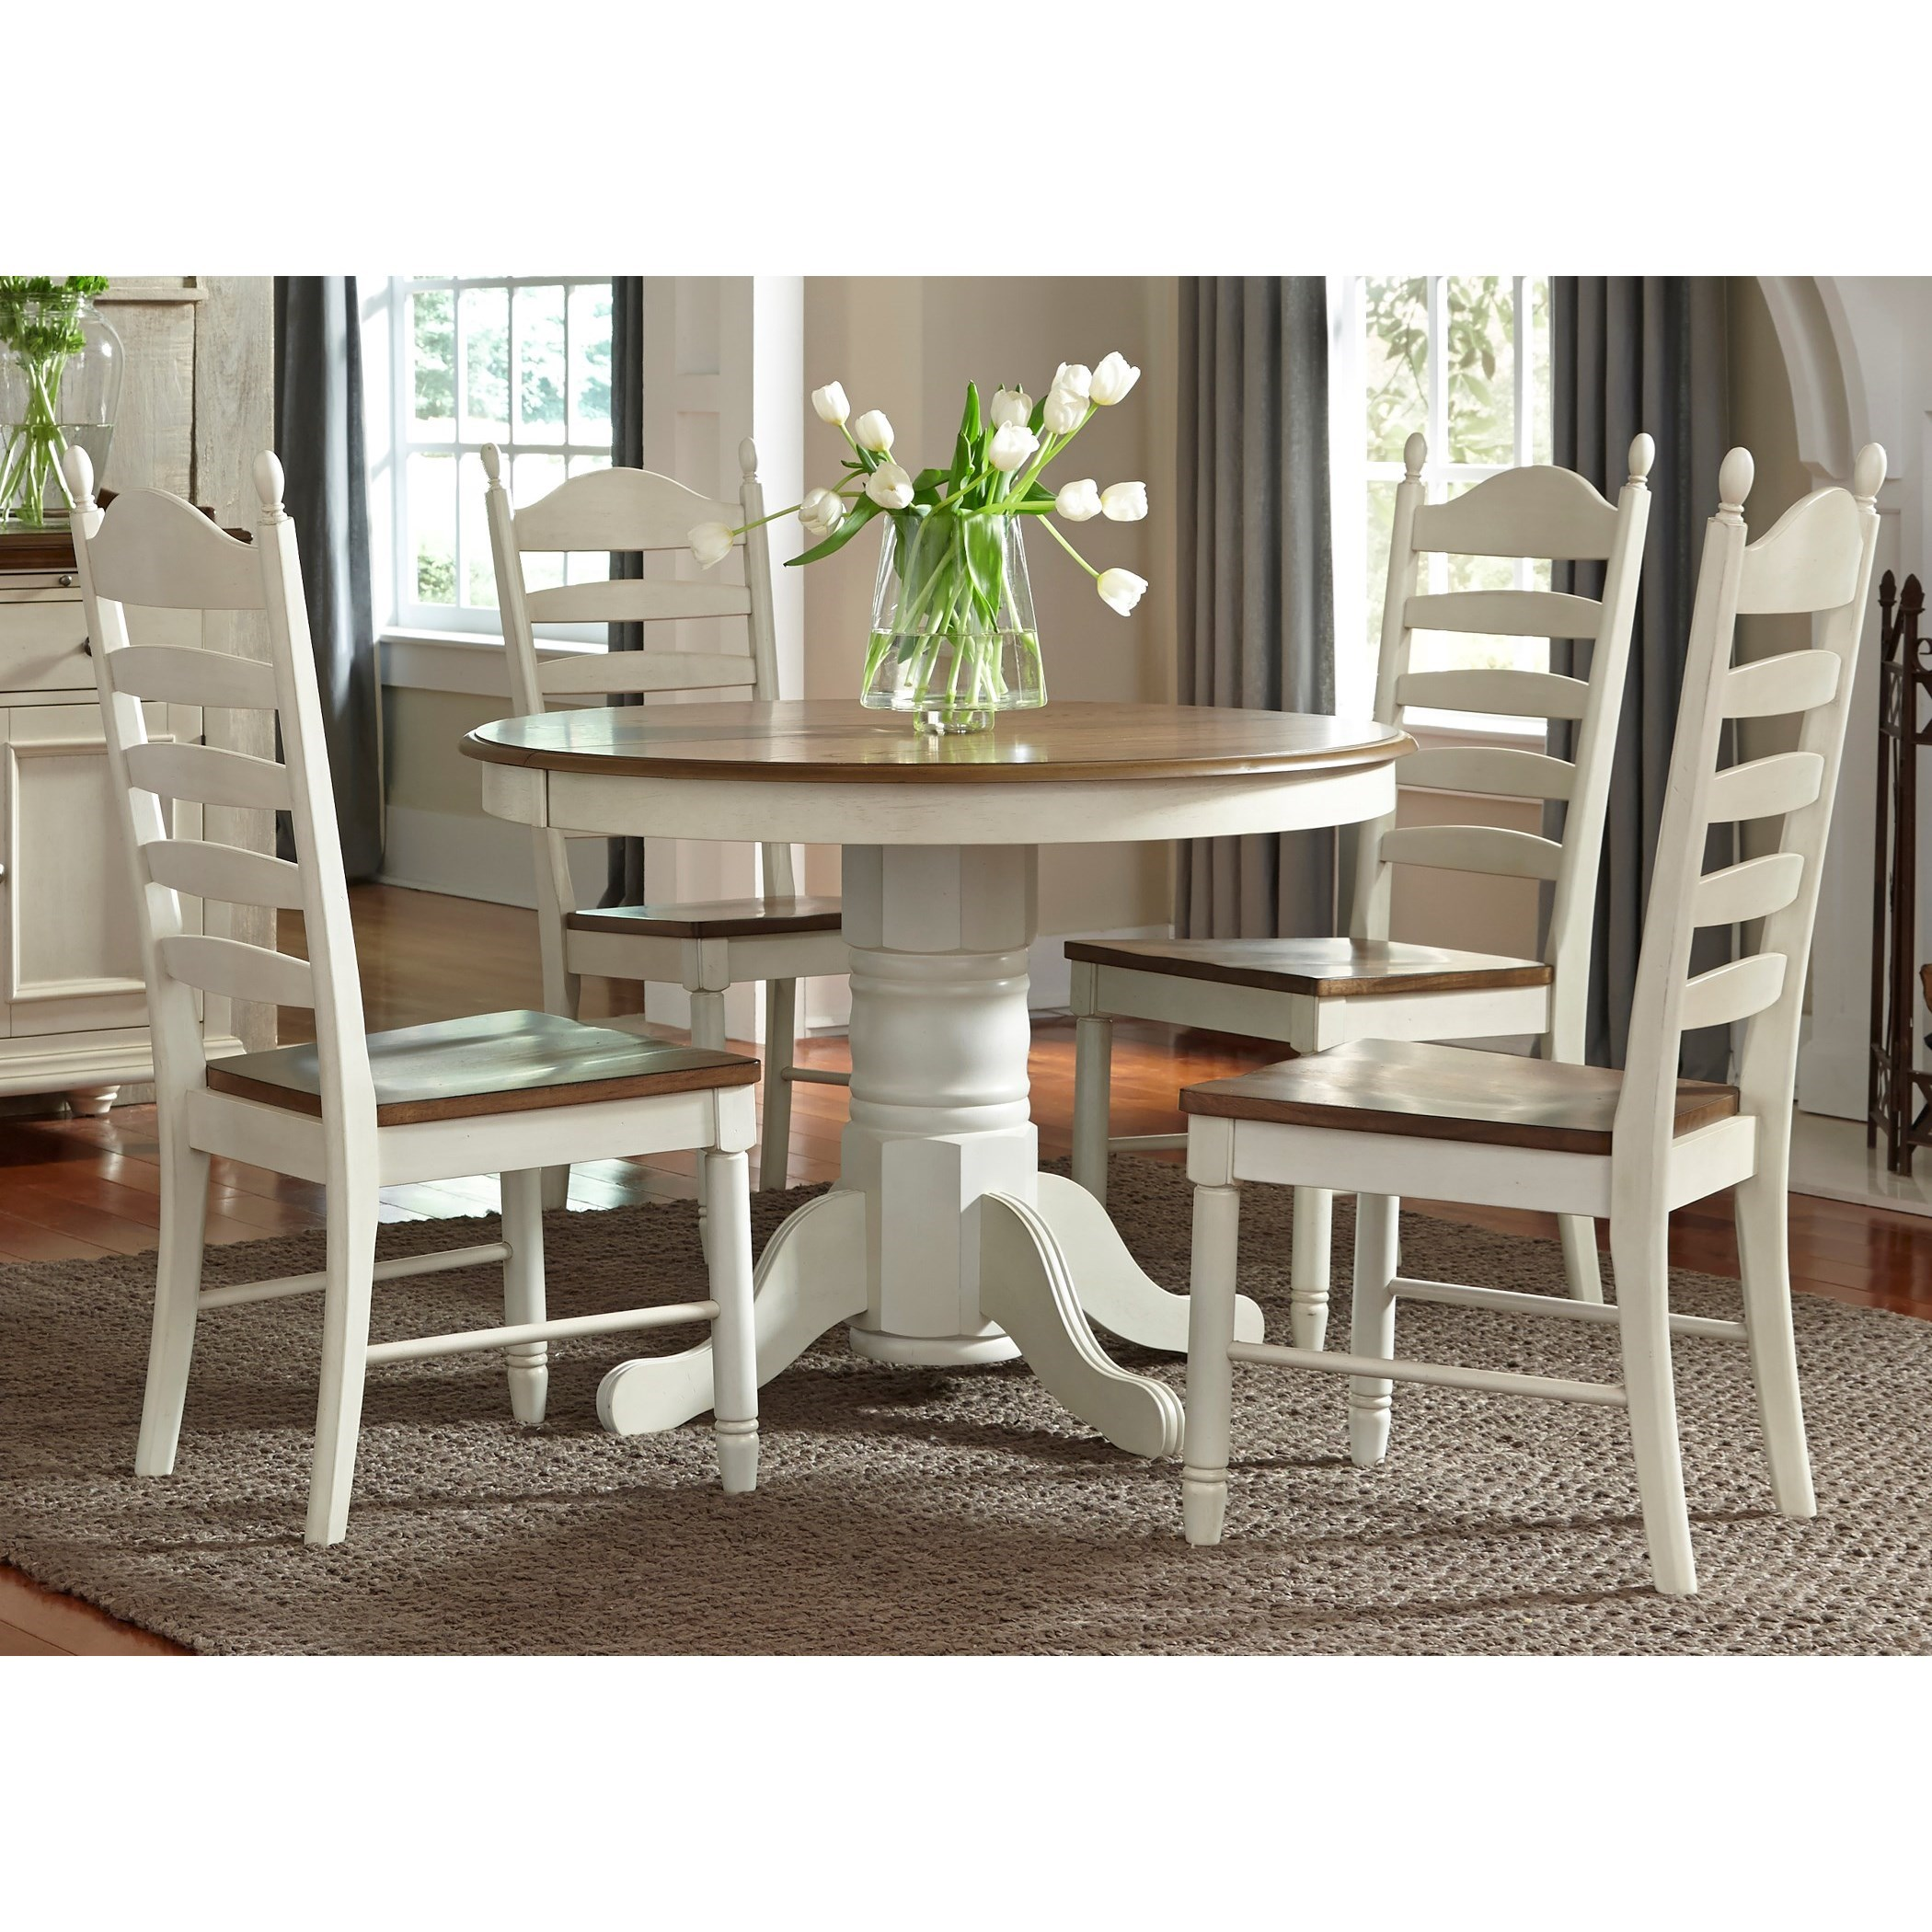 Liberty Furniture Springfield 7 Piece Pedestal Table Set: Springfield Dining 5 Piece Pedestal Table & Chair Set